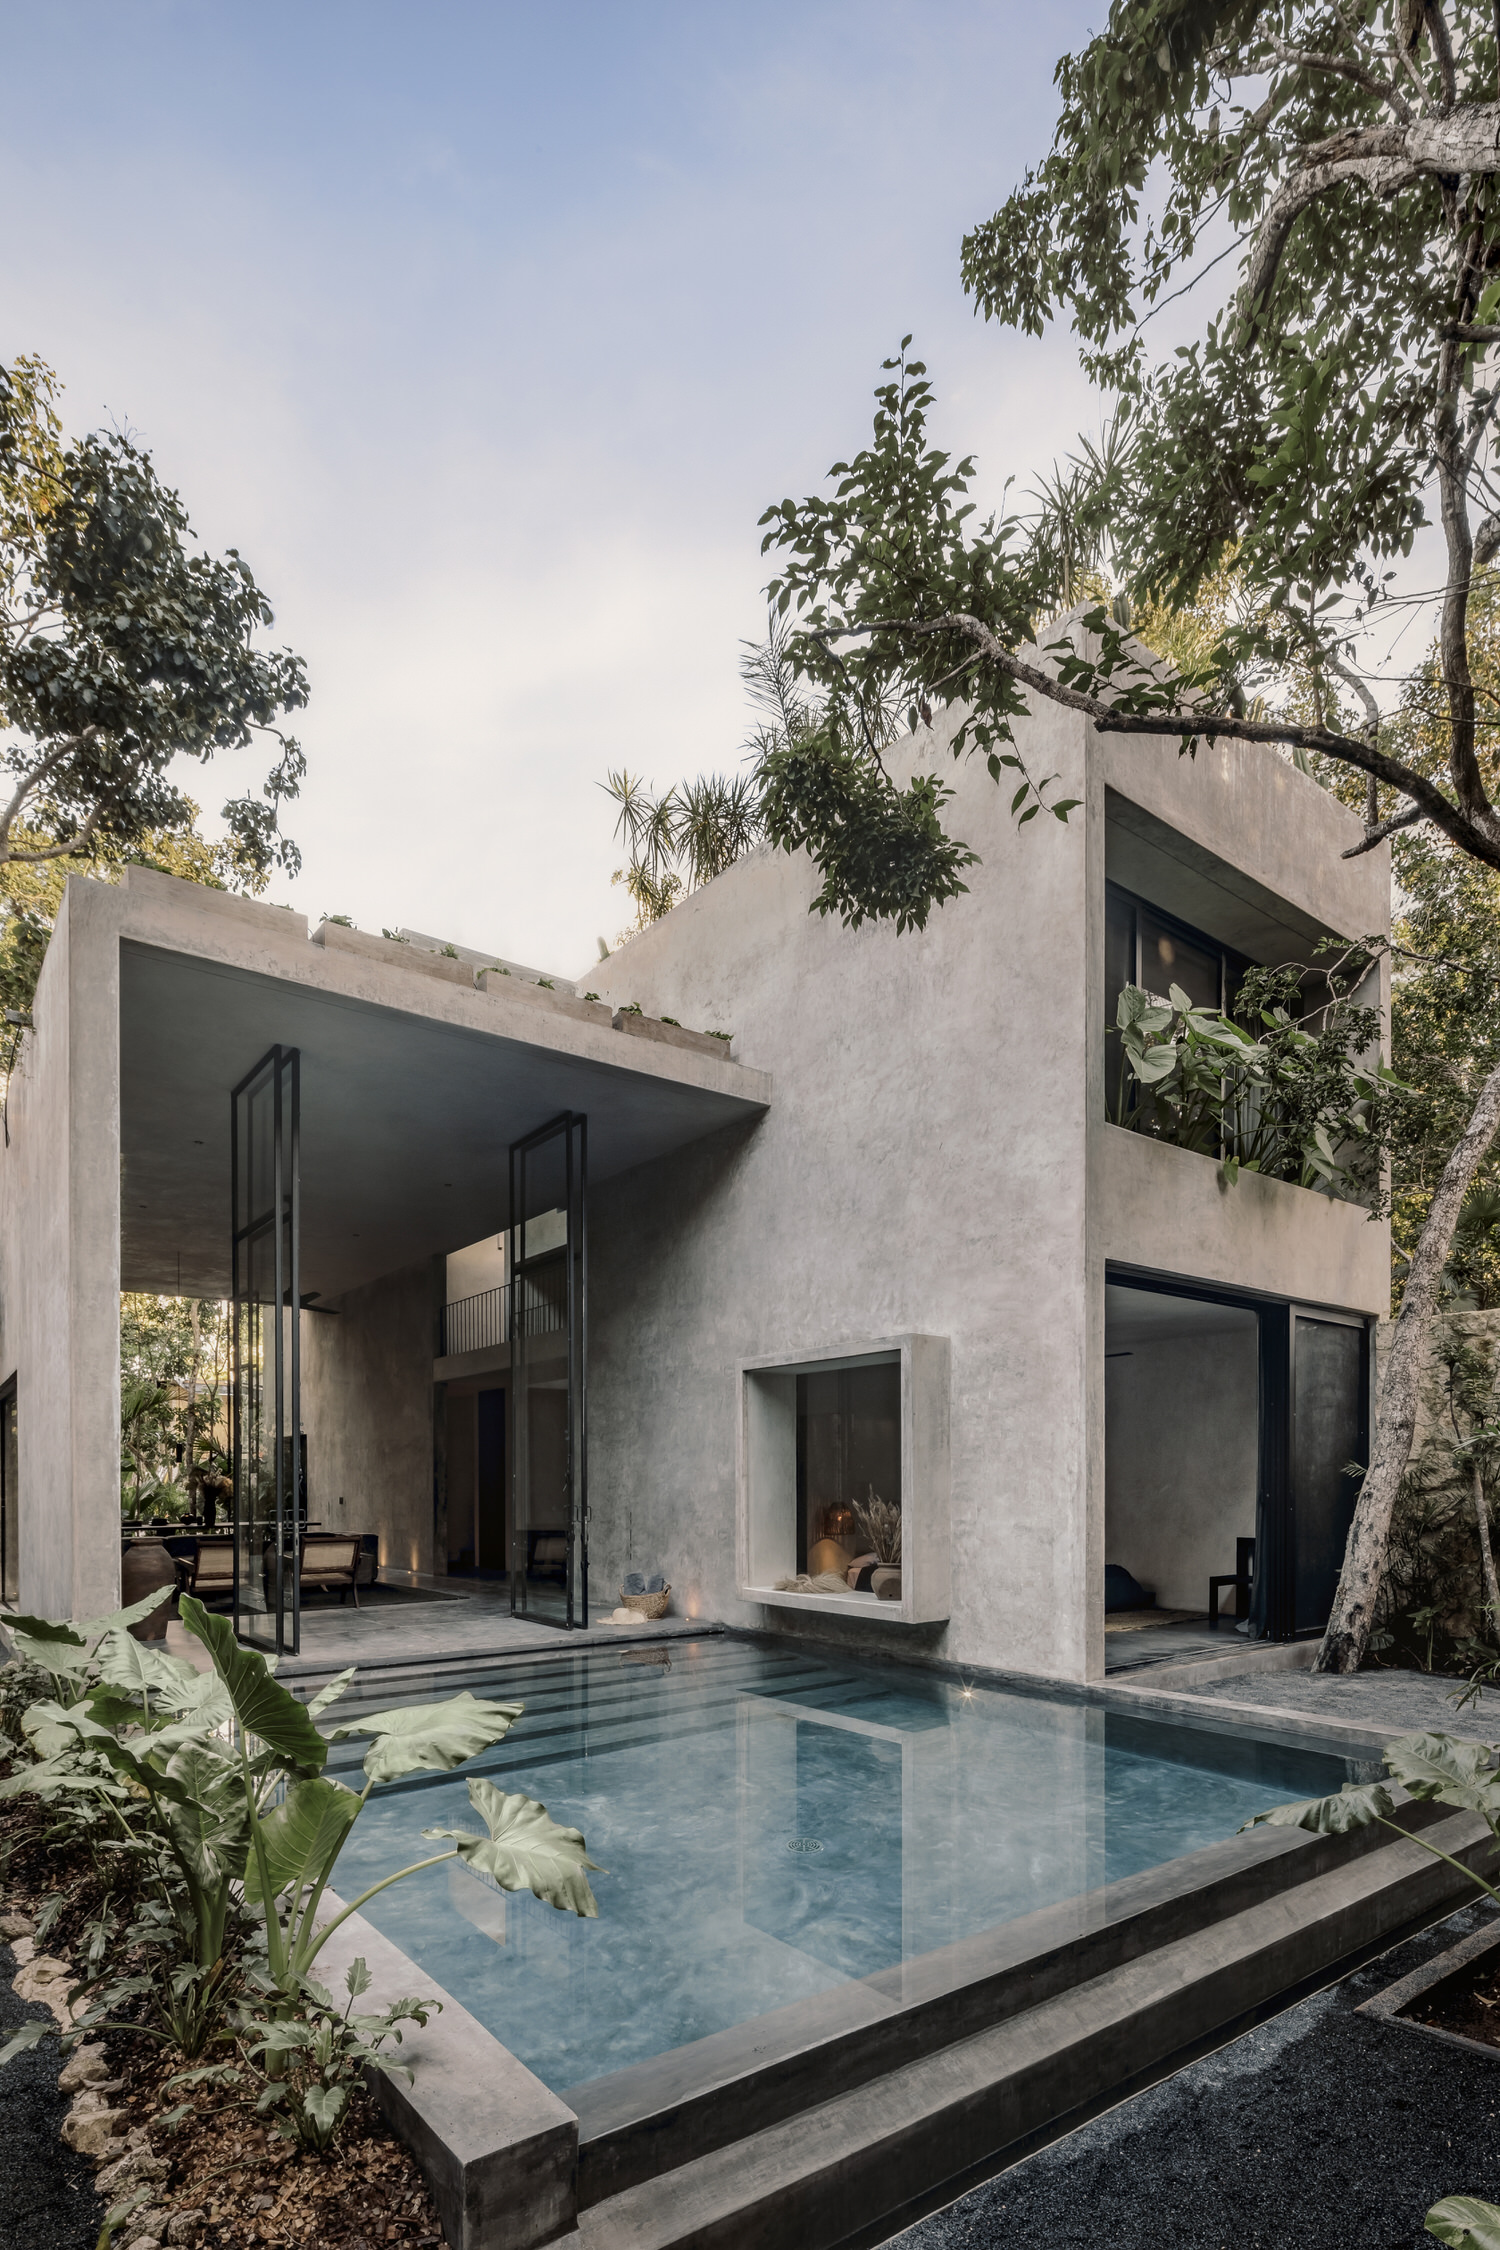 Co Lab Design Office Aviv House Tulum Mexico Arxhitecture Photo Cesar Bejar Yellowtrace 02